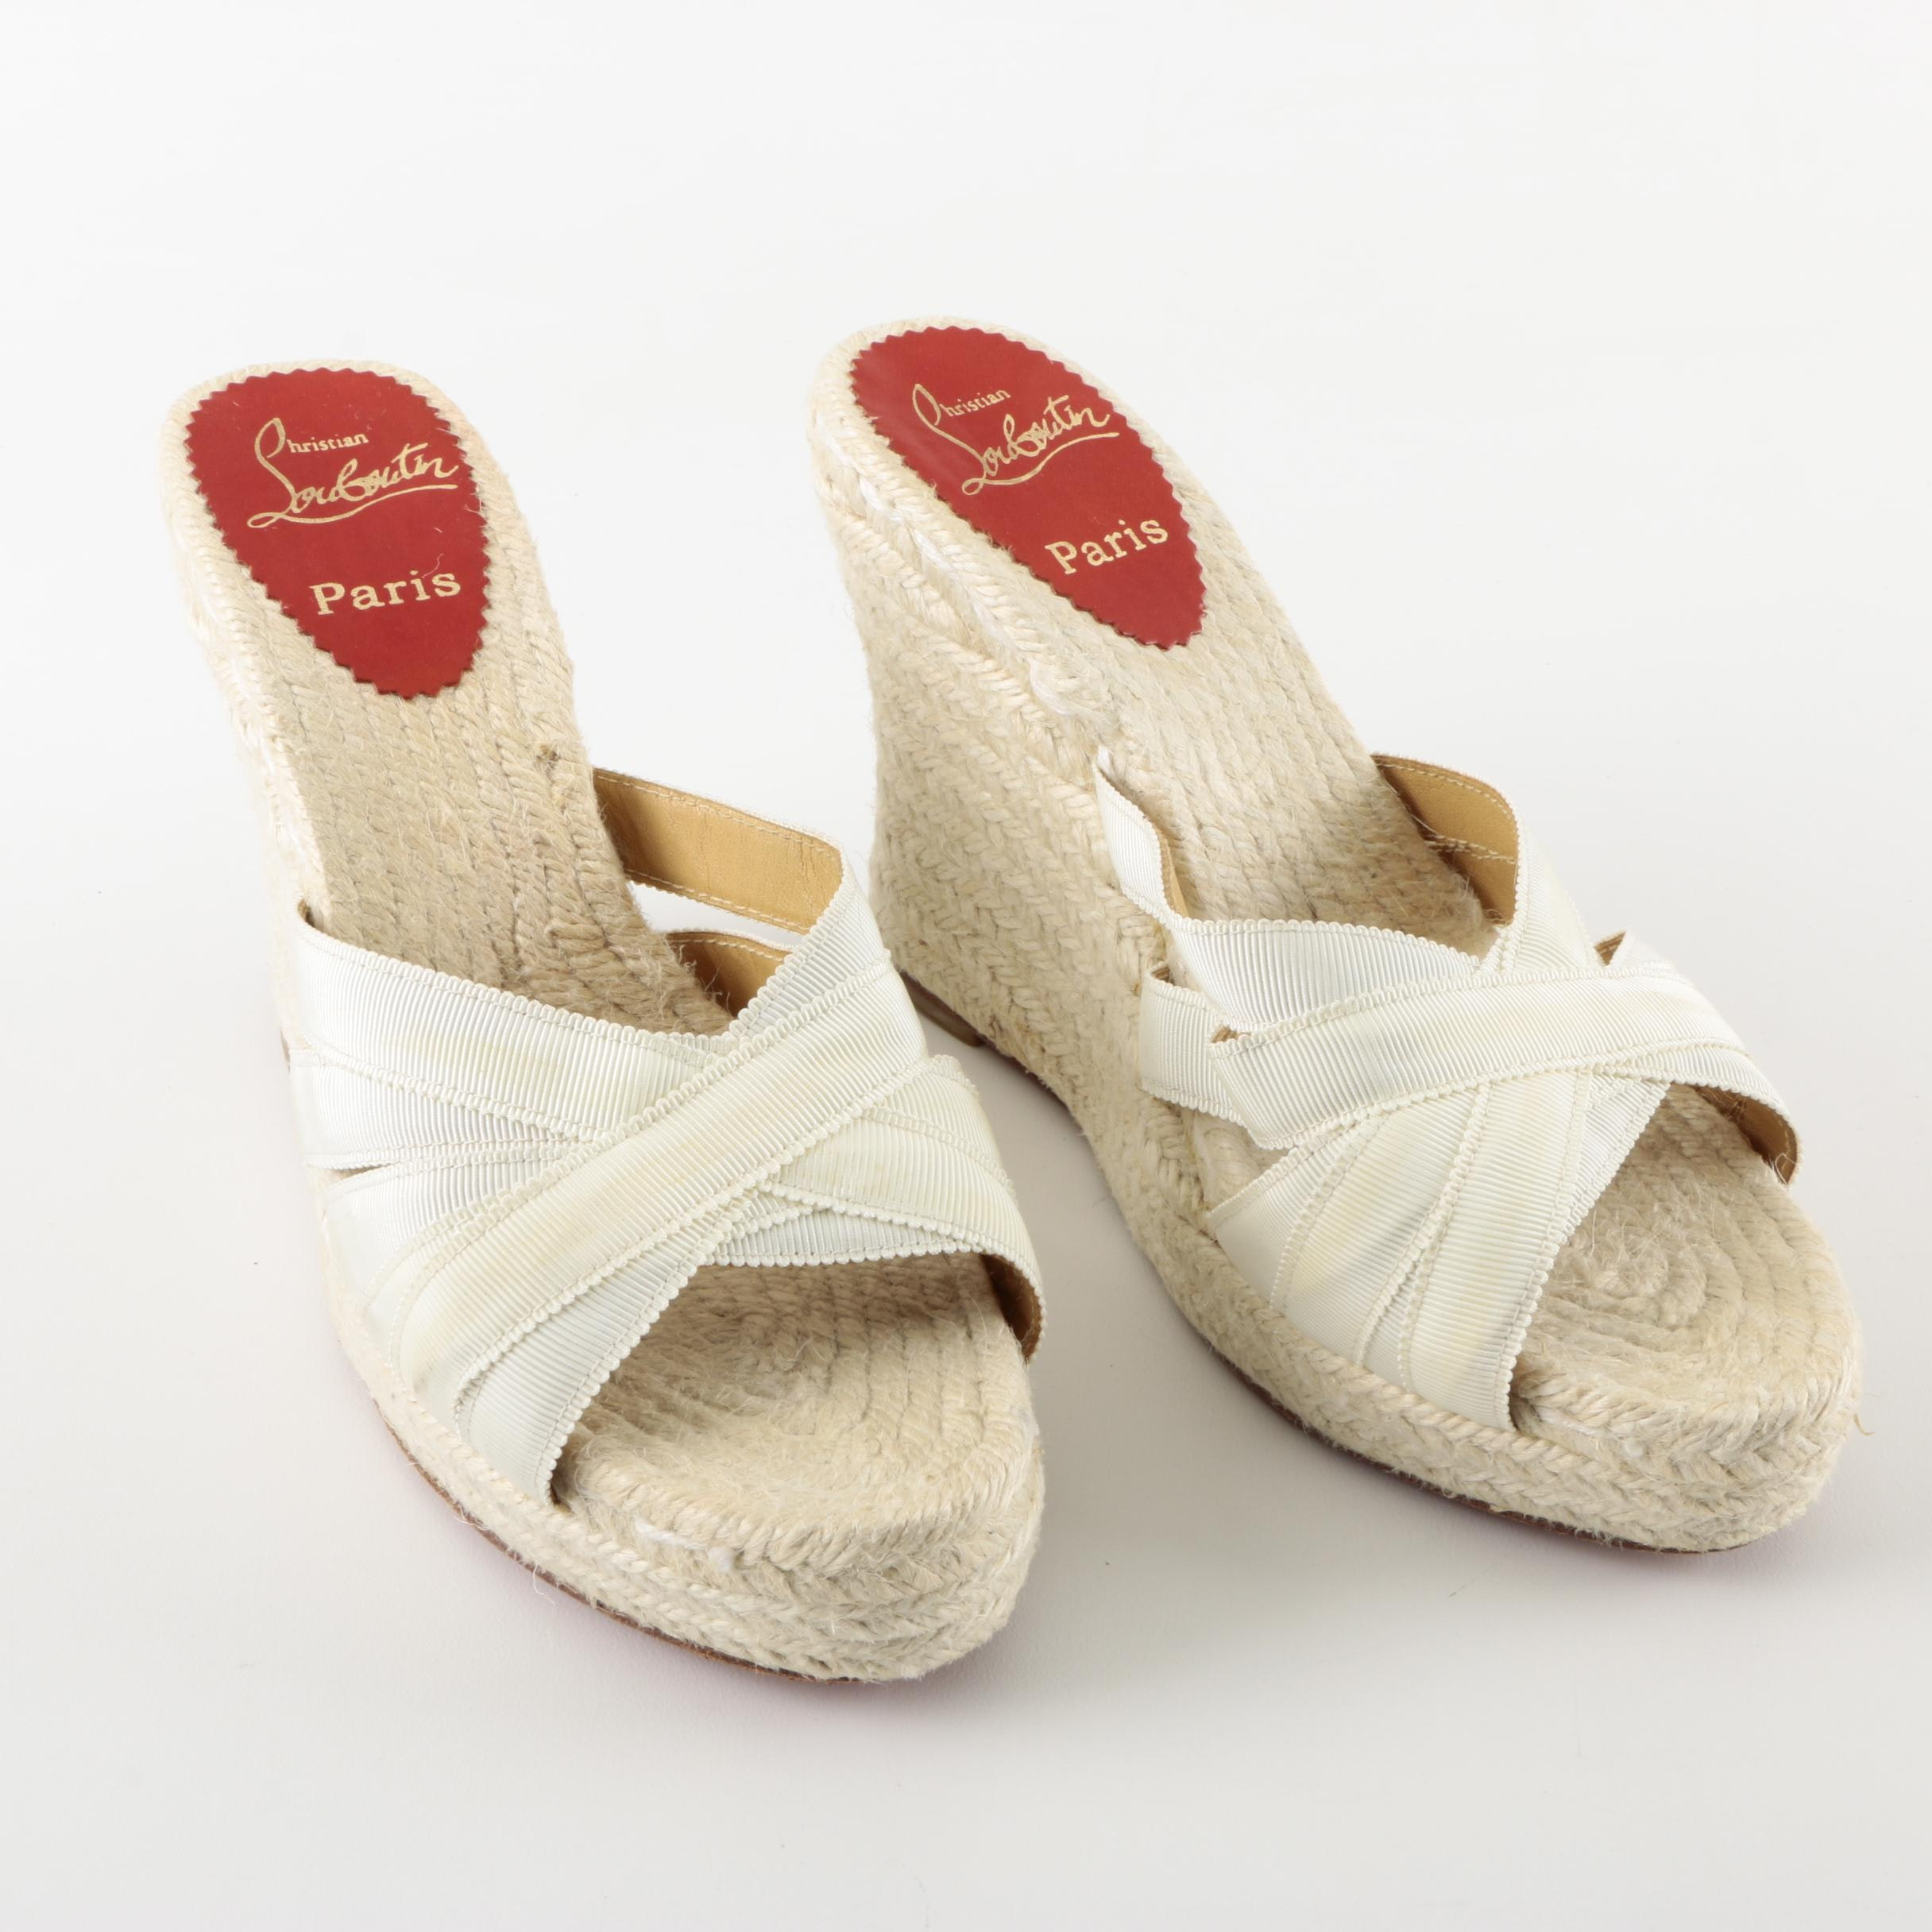 Christian Louboutin Espadrille Wedge Sandals